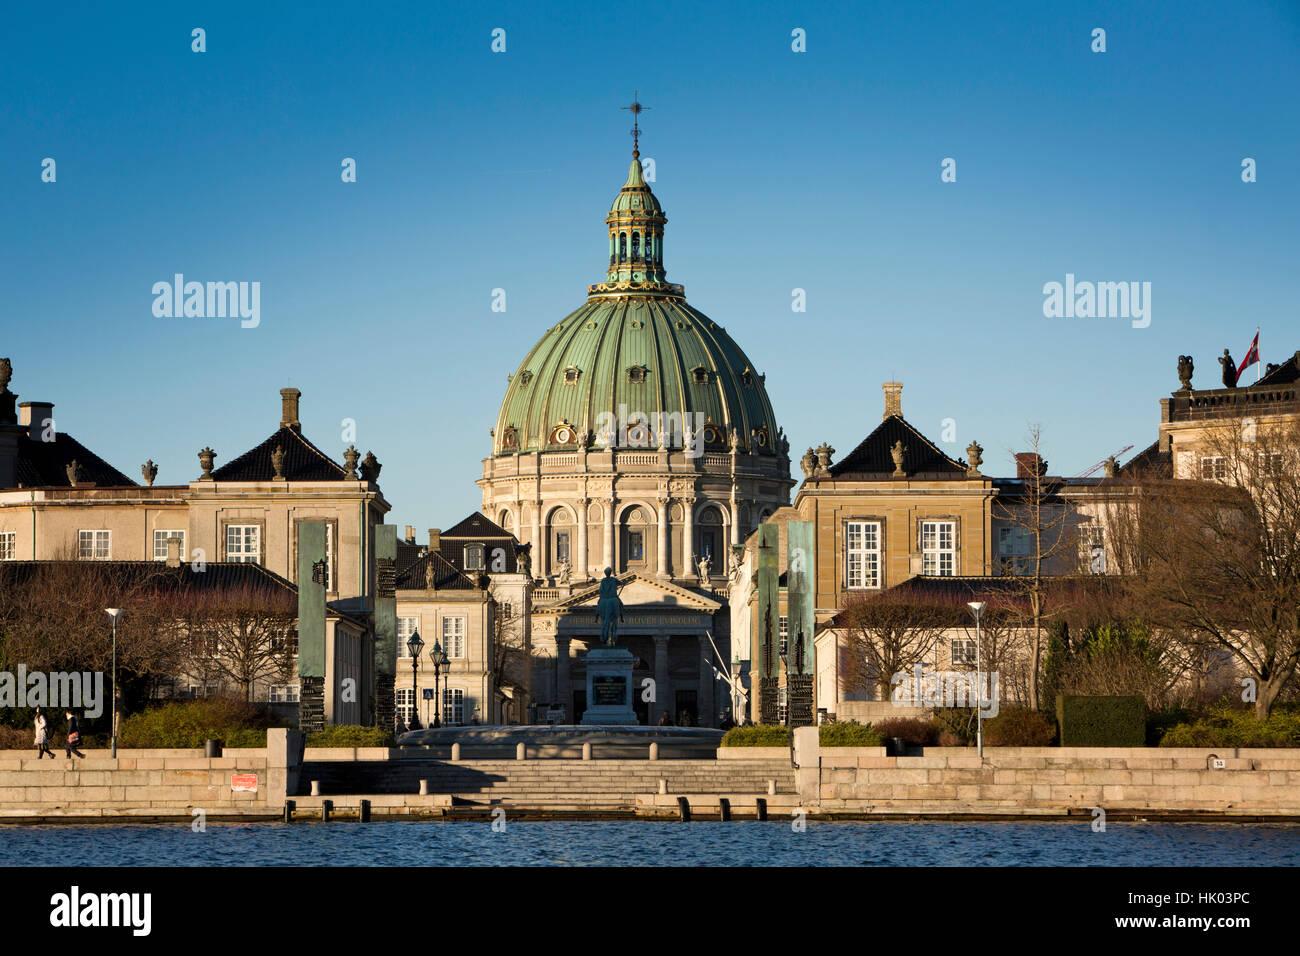 Denmark, Copenhagen, Frederiks Kirke, the Marble Church, through Amaliehaven Palace - Stock Image